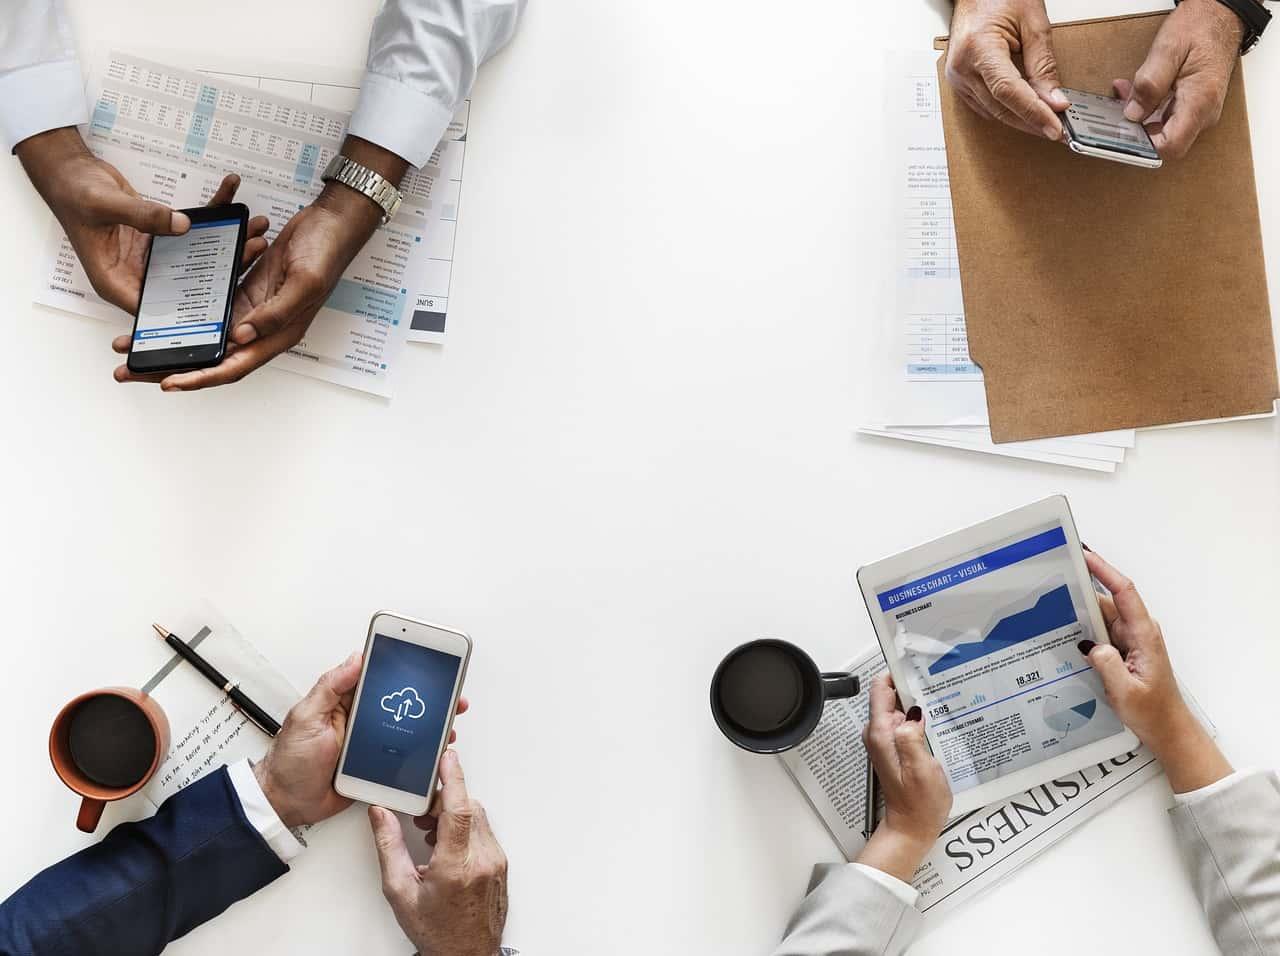 Digital marketing ideas